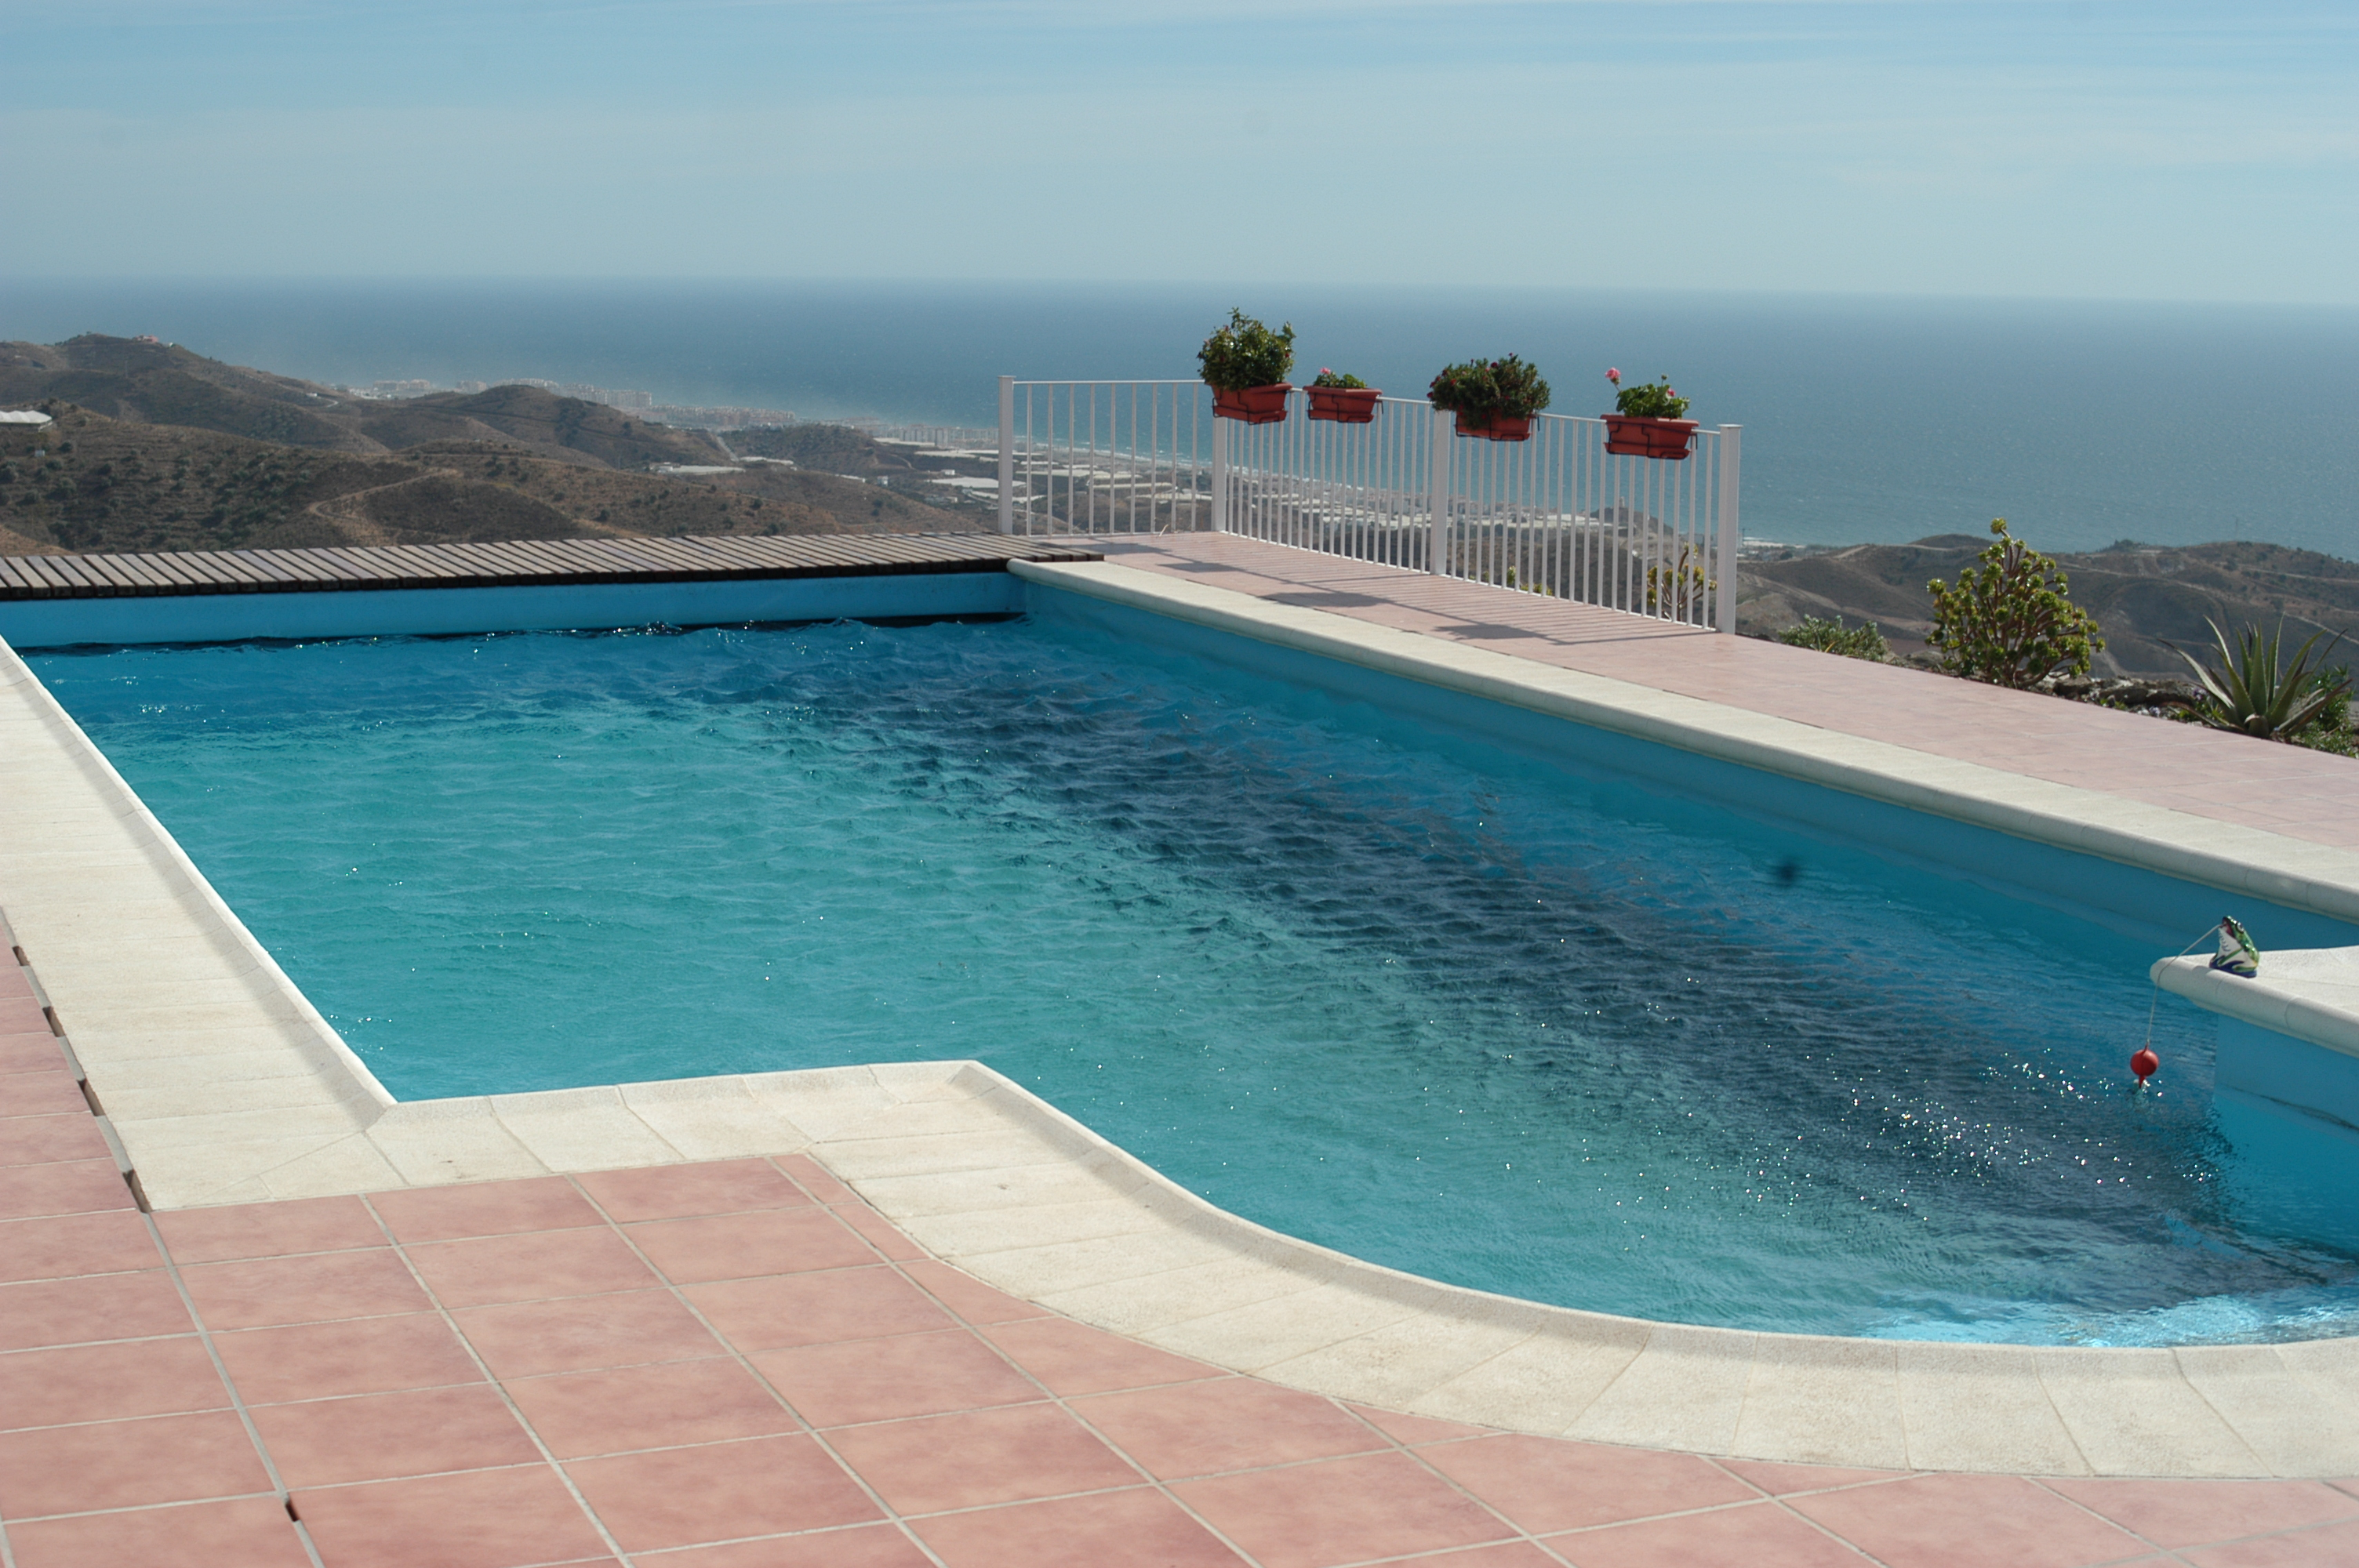 2 Pool Sayalonga